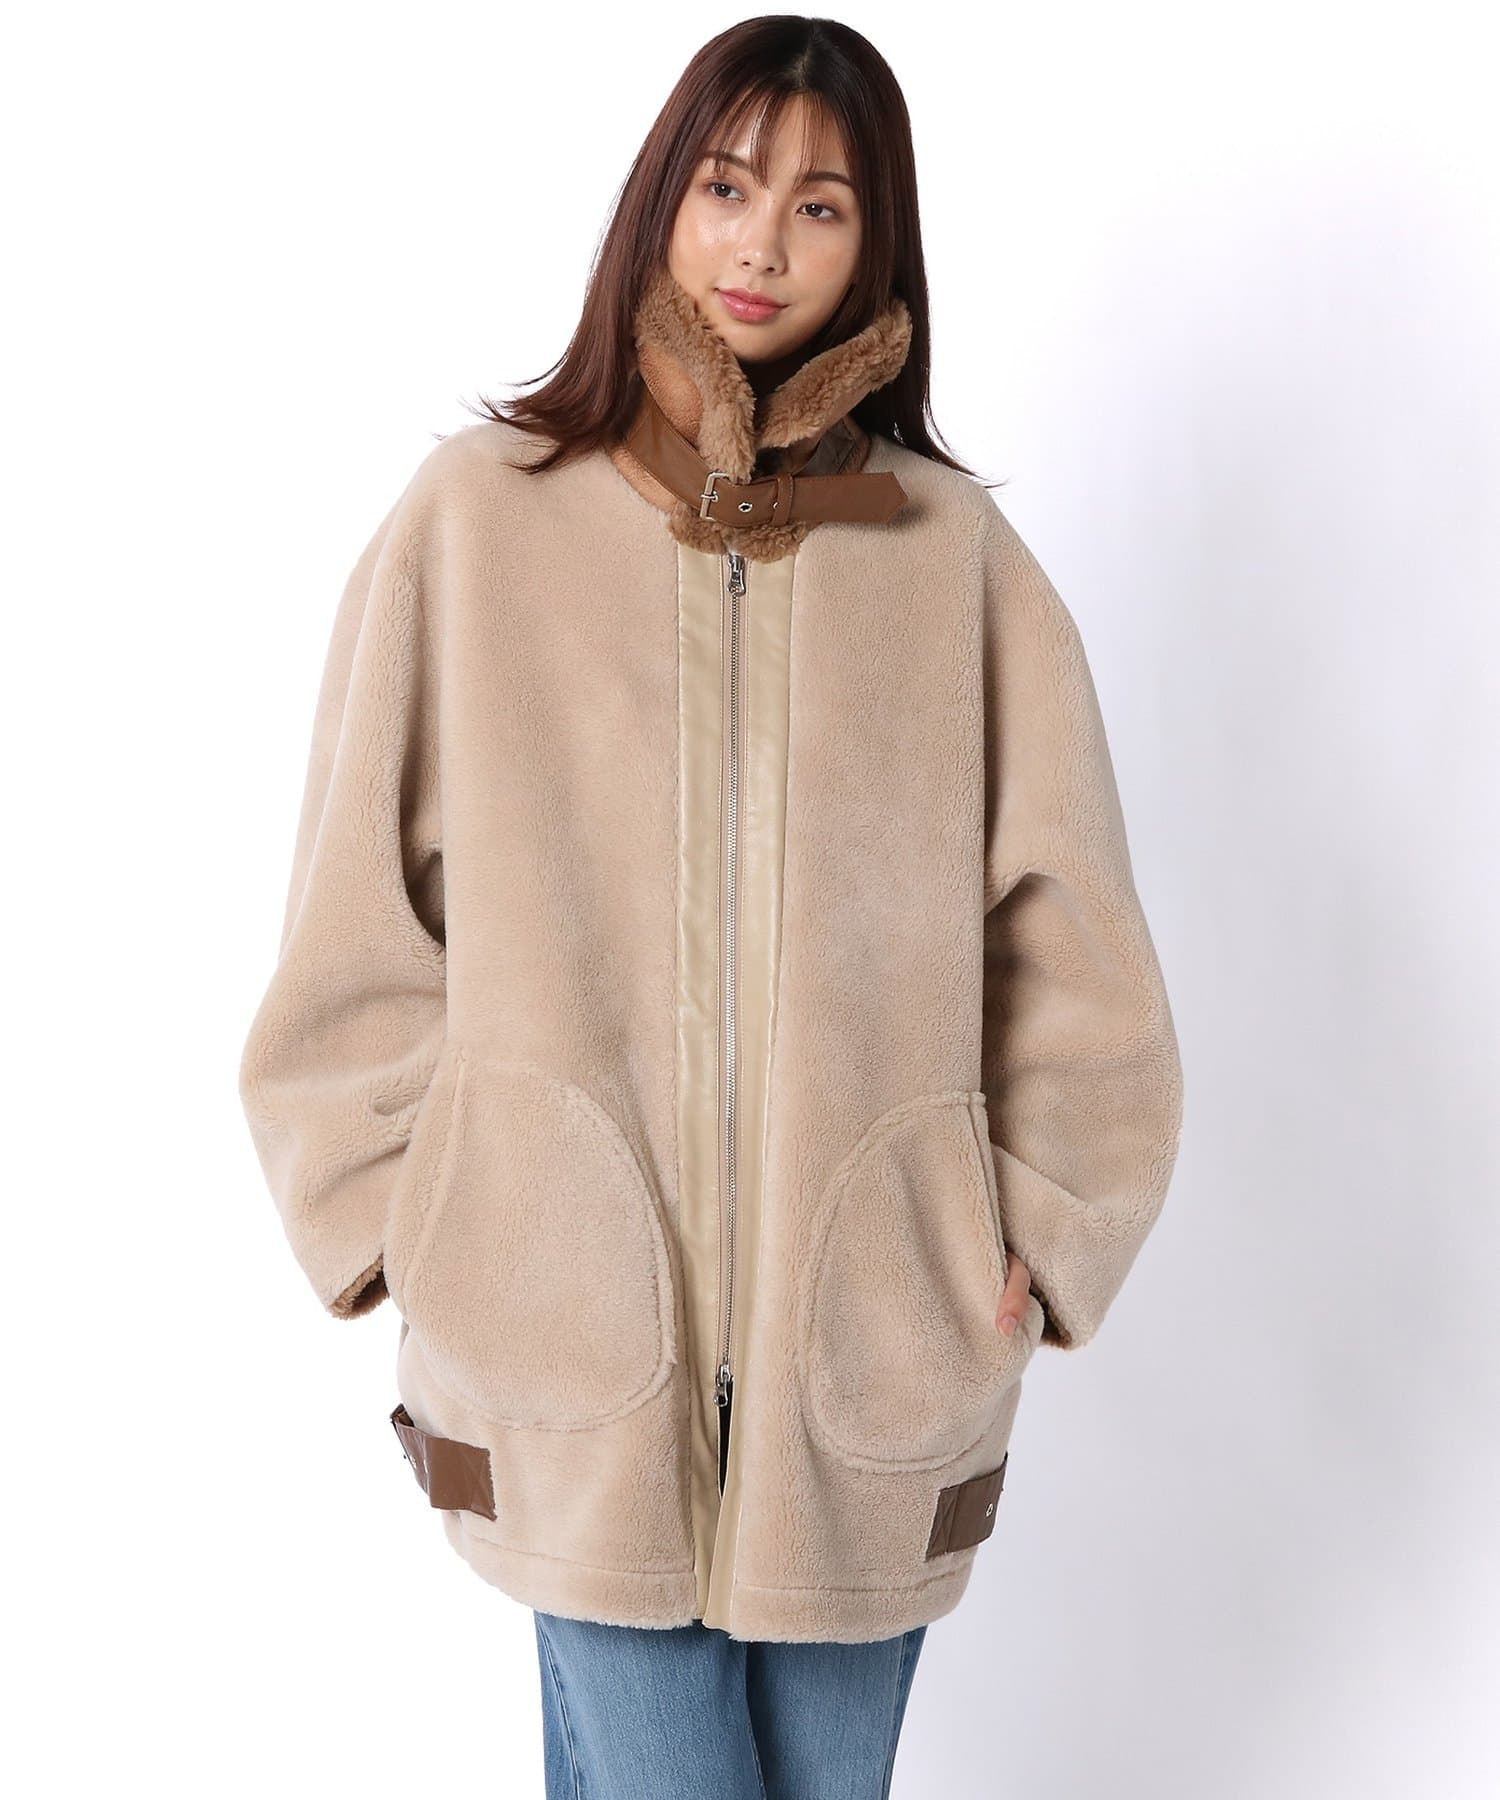 Lui's(ルイス) ウール混シープボアB3ジャケット